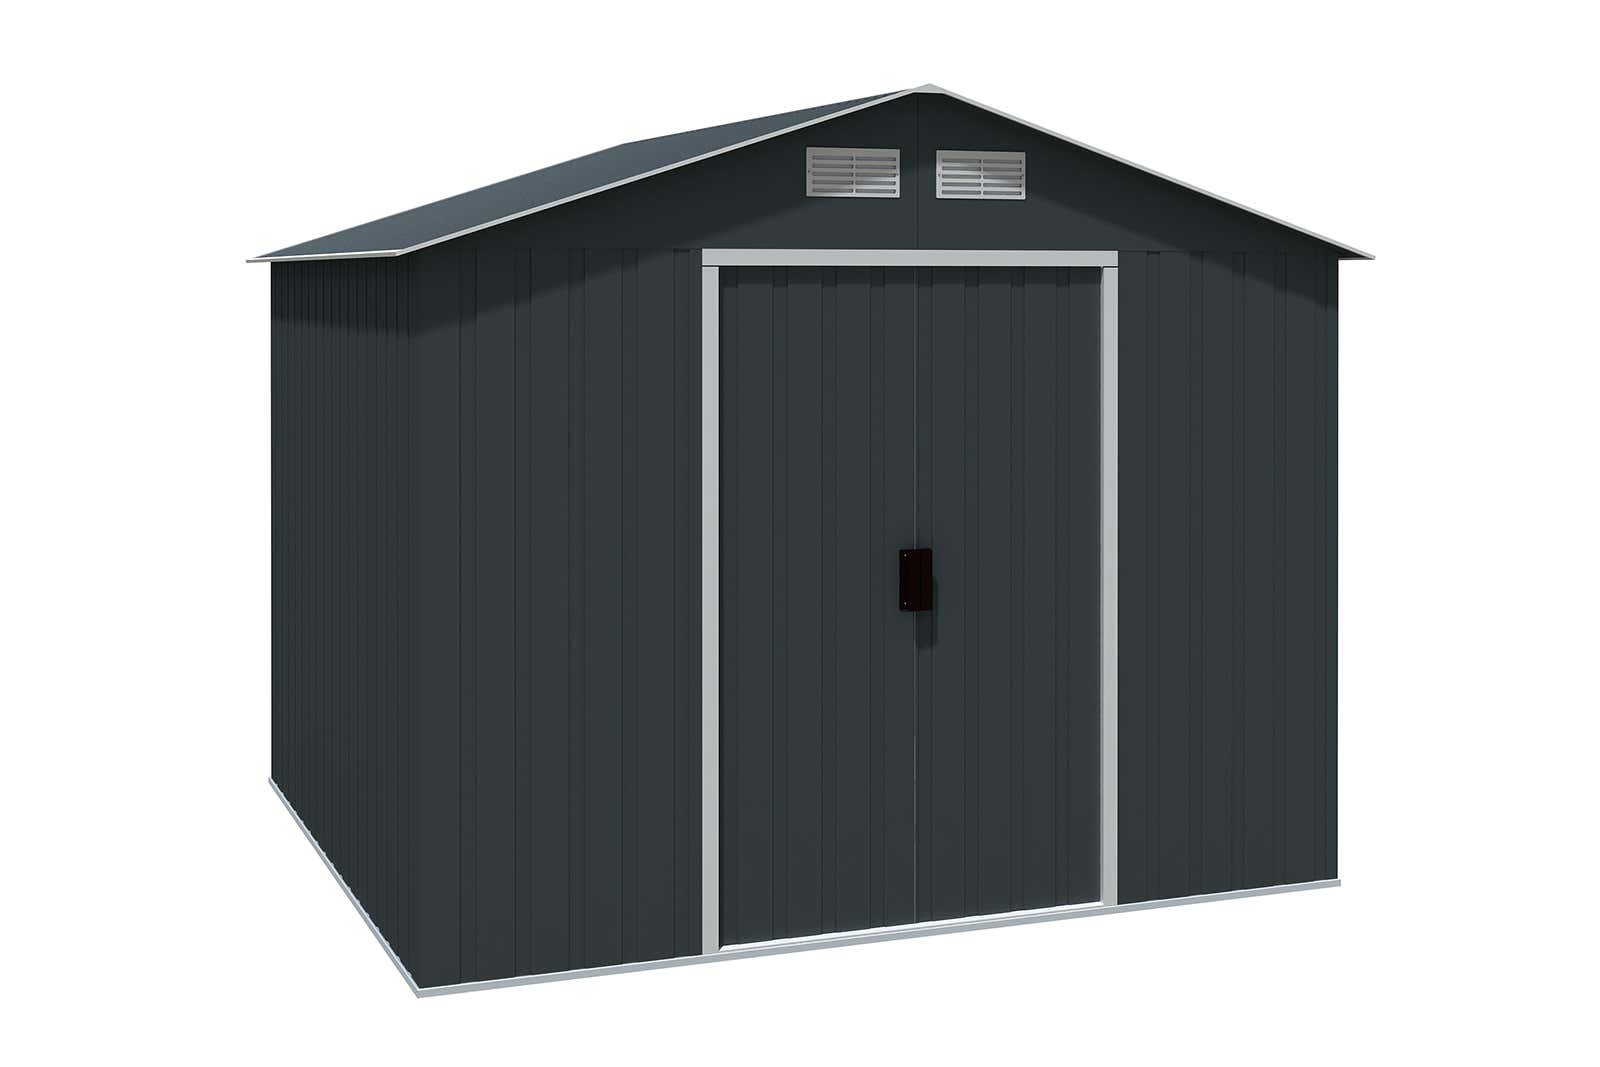 metallger tehaus titan 8x8 anthrazit 7244 a z gartenhaus gmbh. Black Bedroom Furniture Sets. Home Design Ideas